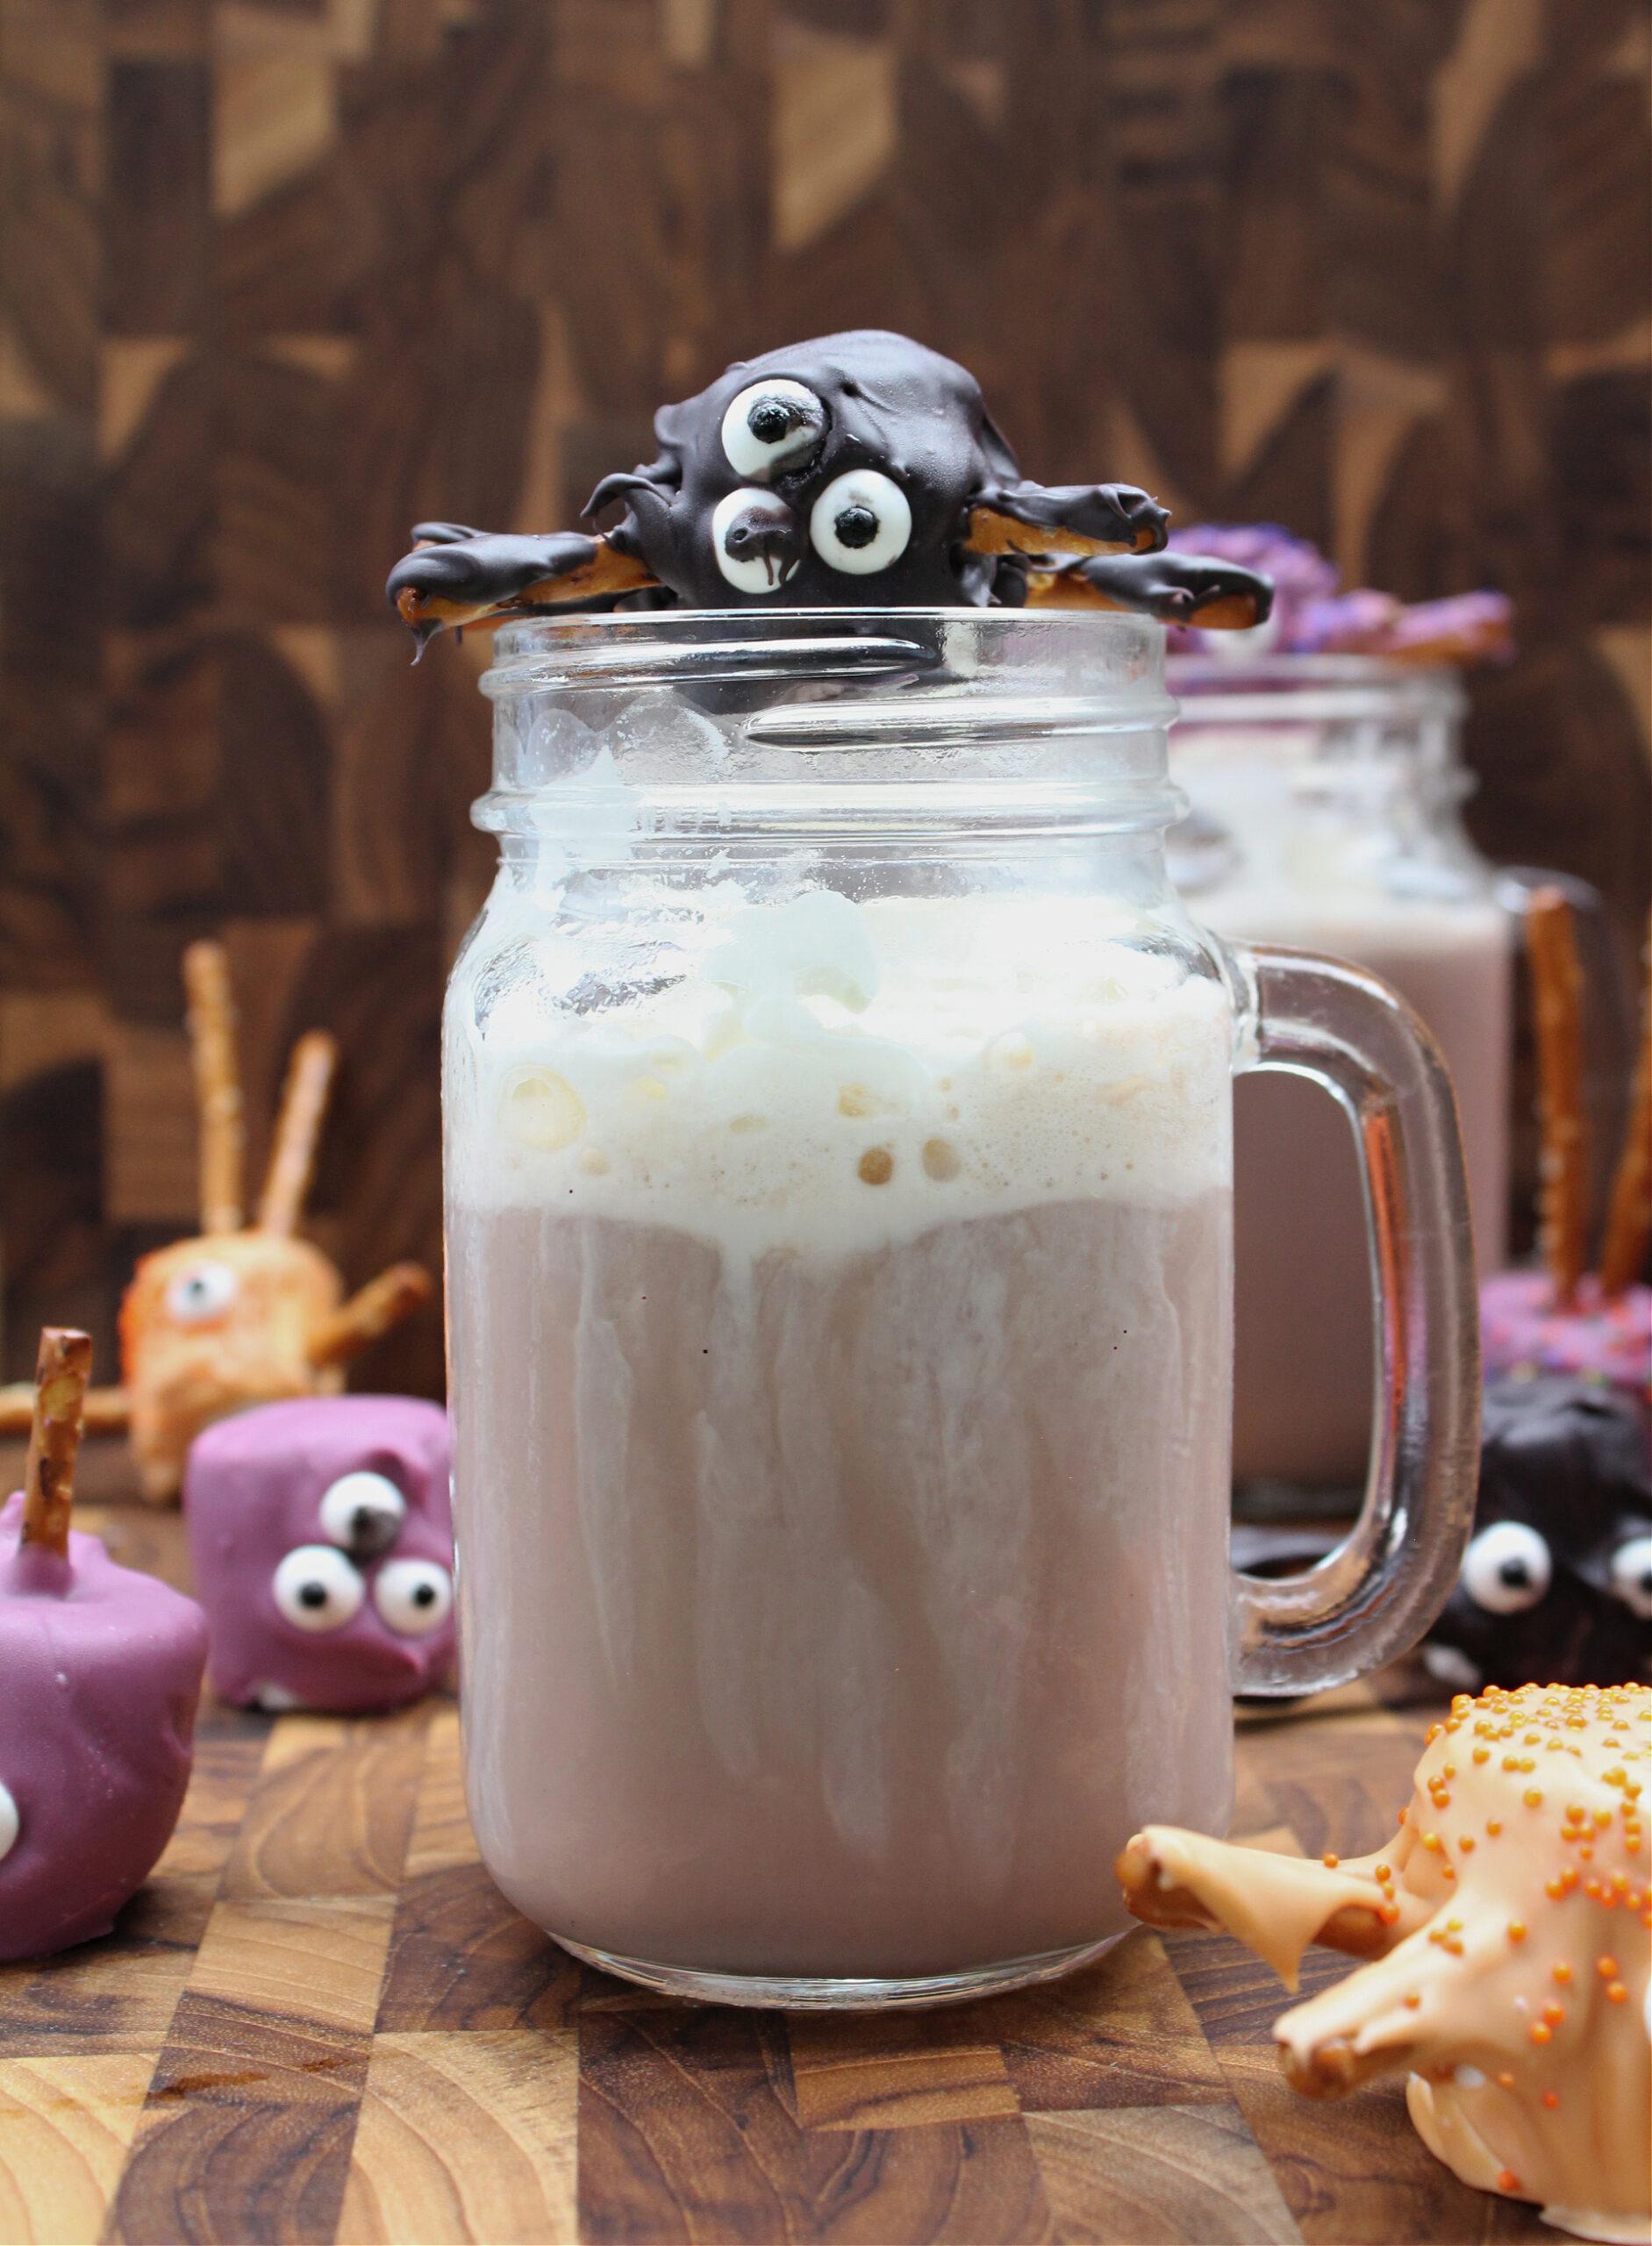 hot chocolate made with chocolate milk